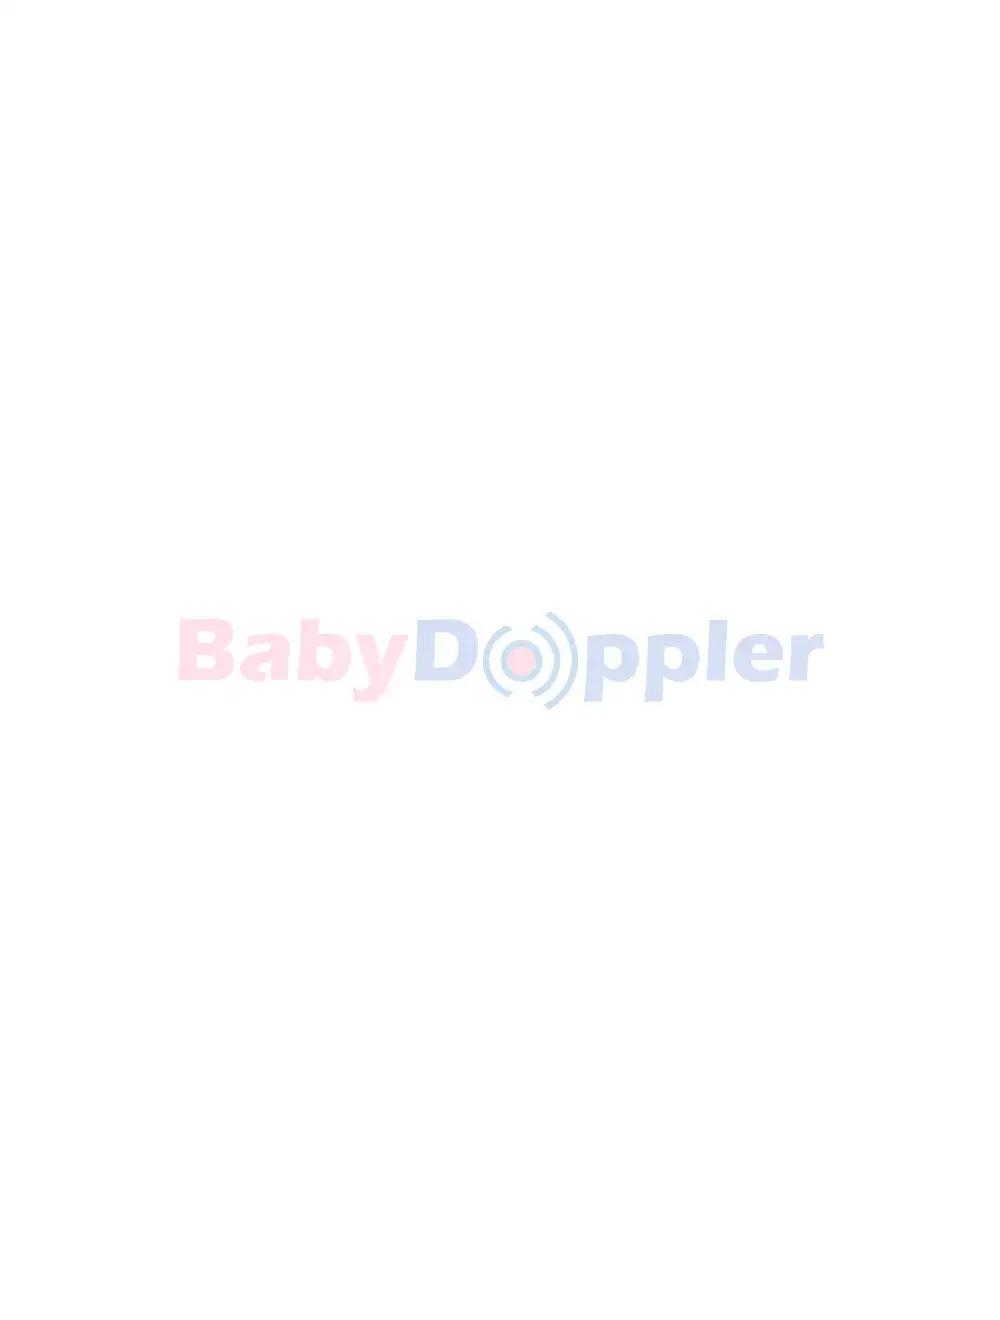 Baby Doppler Baby Scale Birdseye View